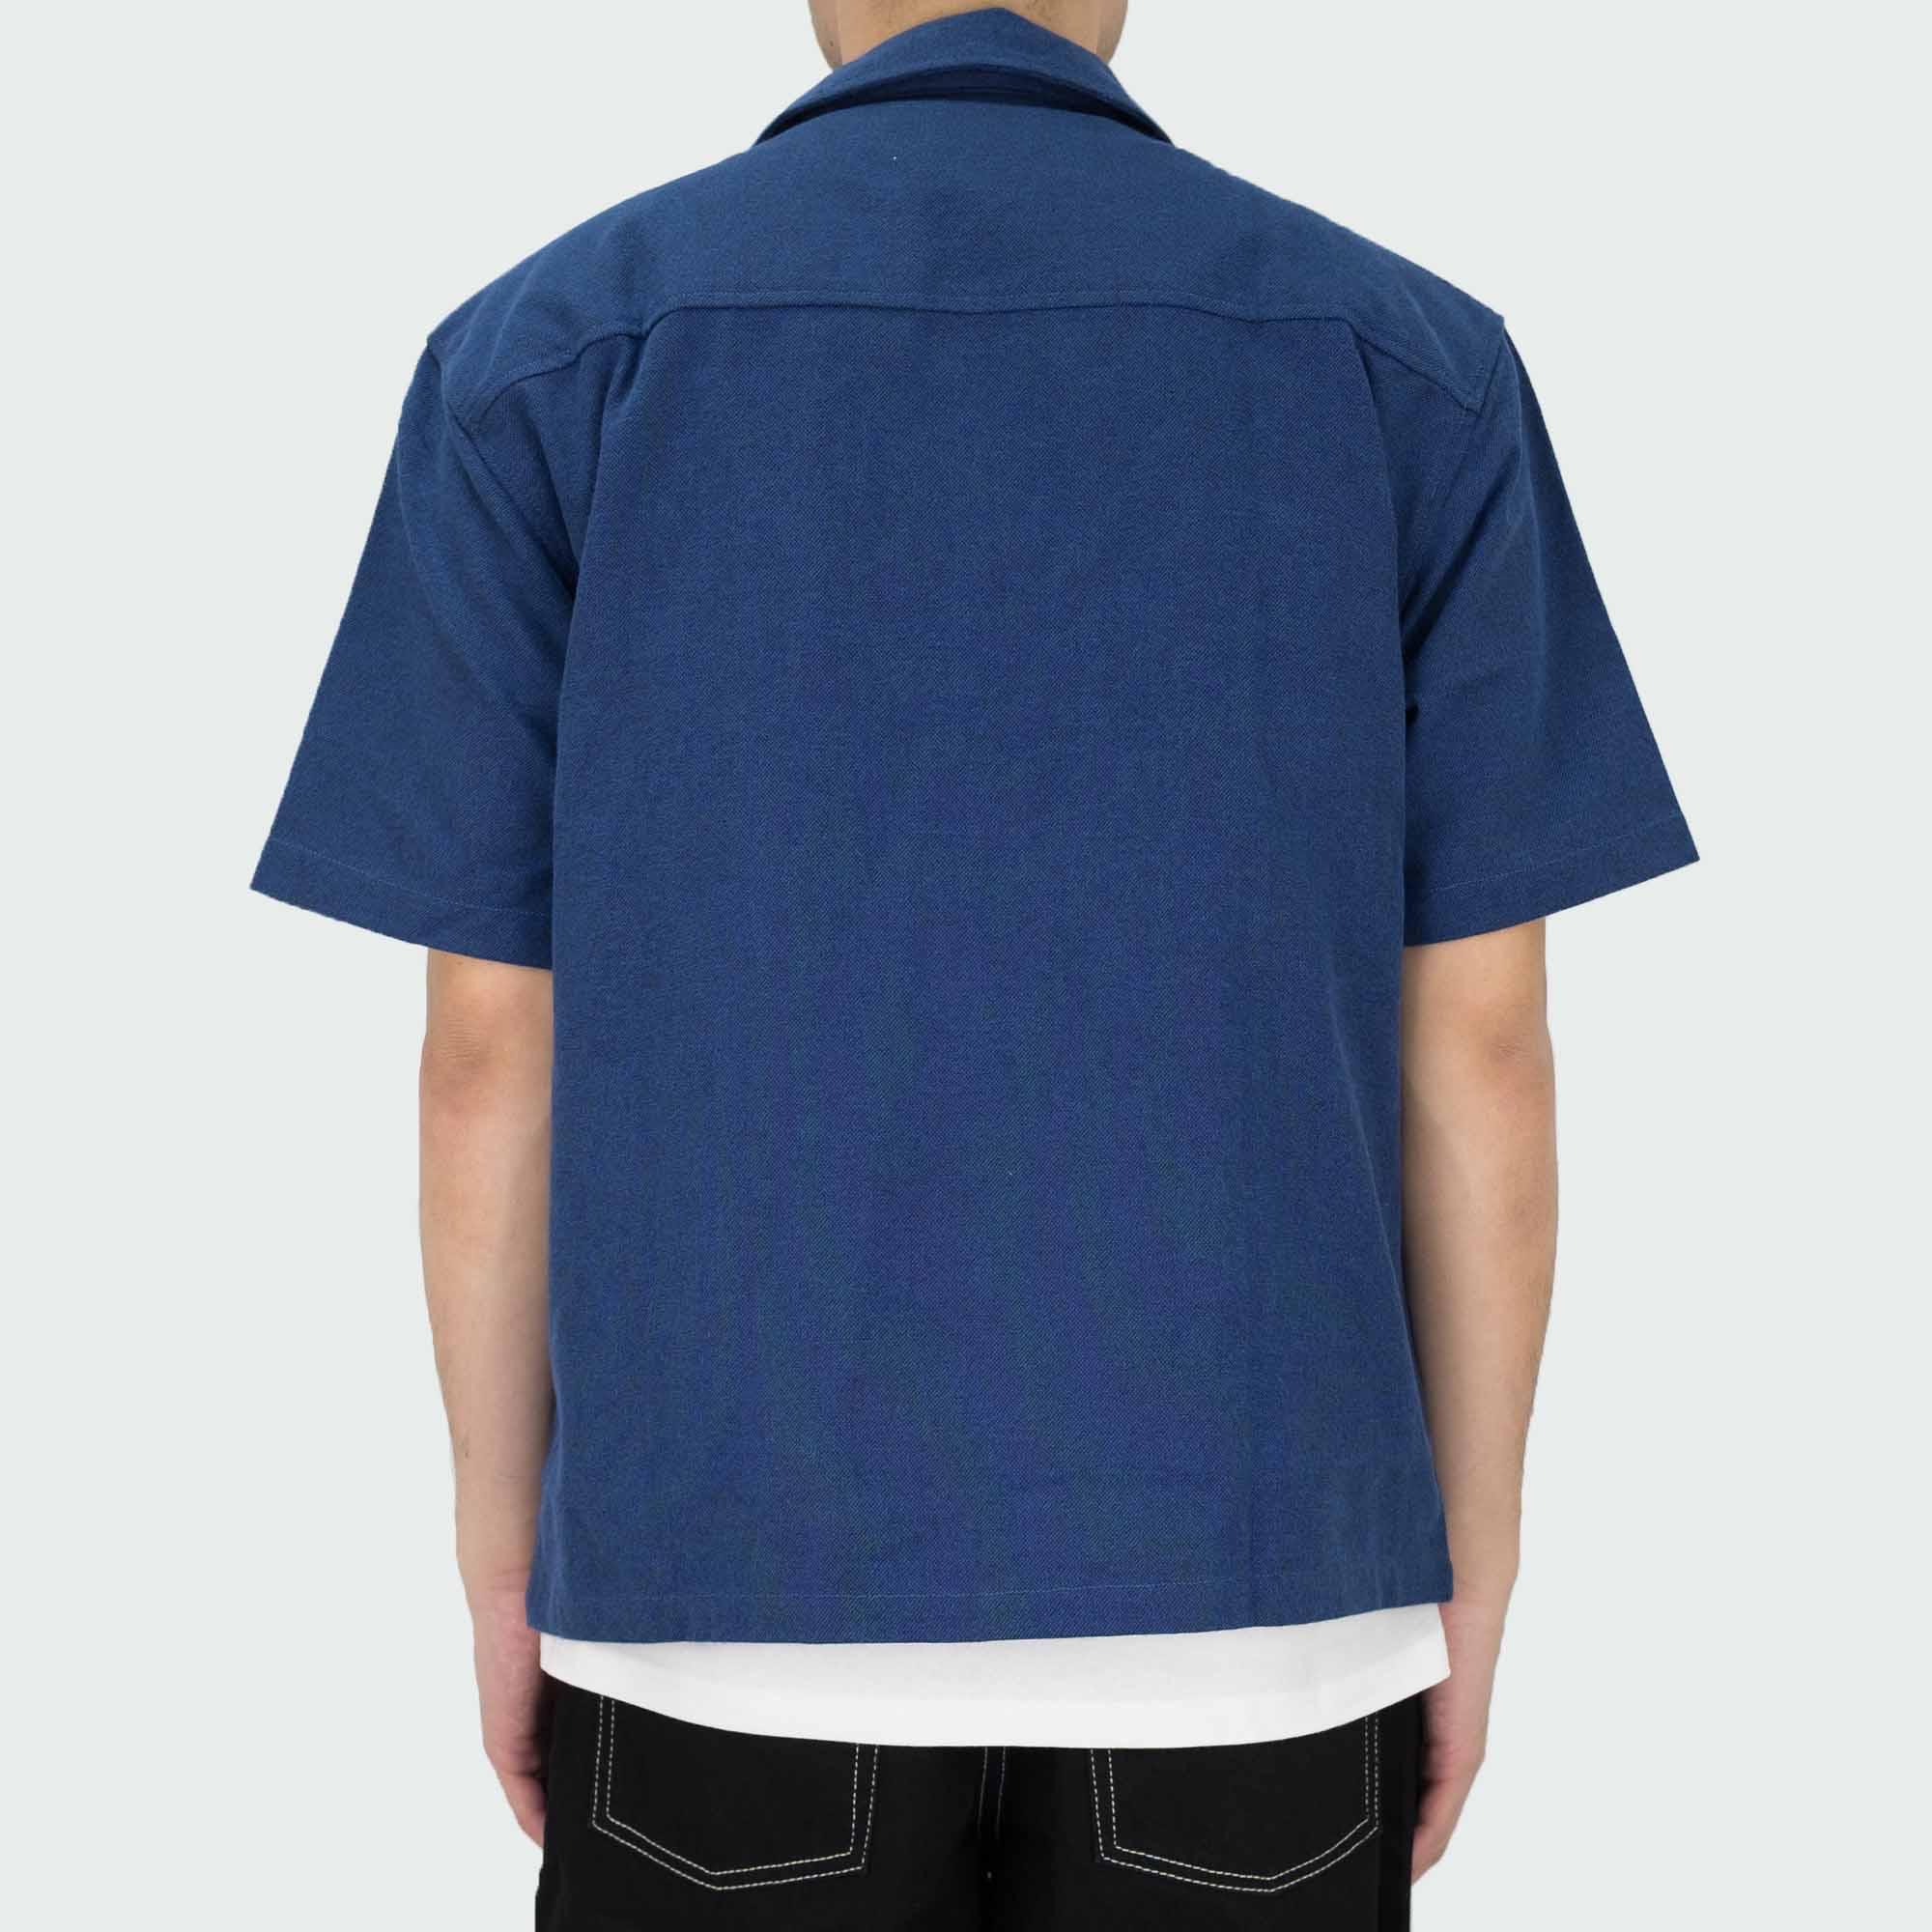 Polar Skate Co. Work Shirt - Blue